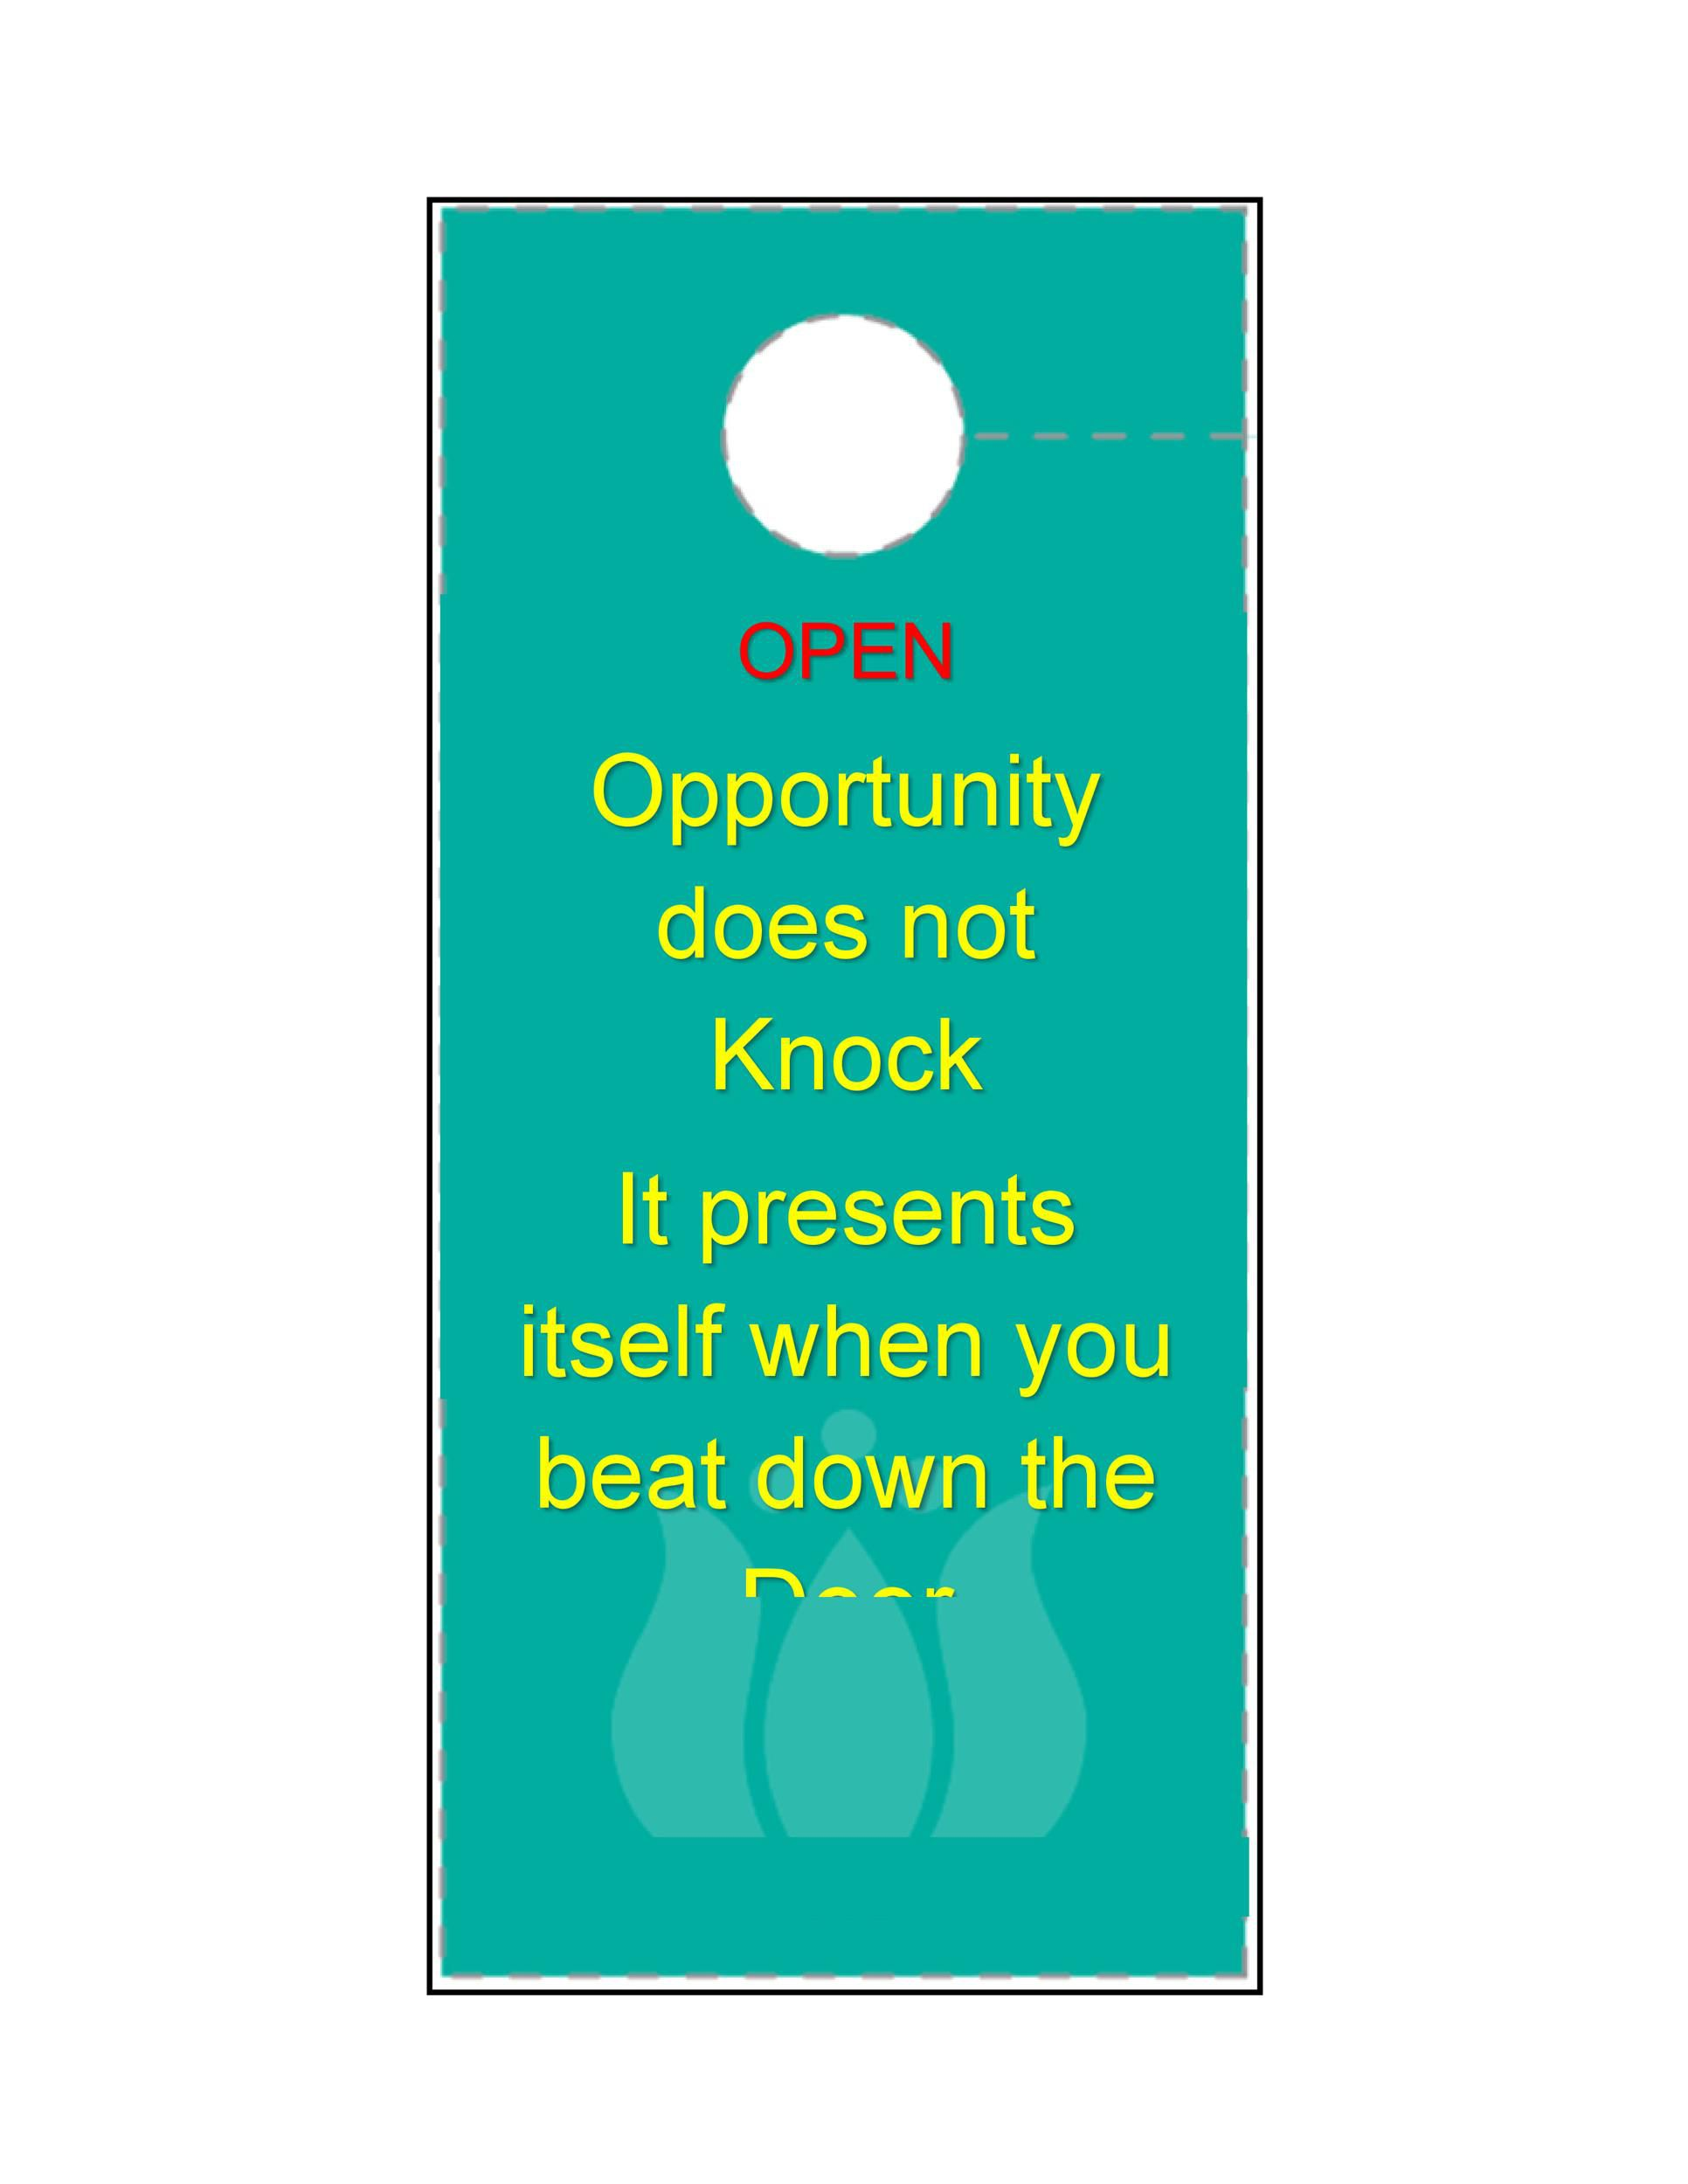 004 Unforgettable Microsoft Word Door Hanger Template Free Picture Full